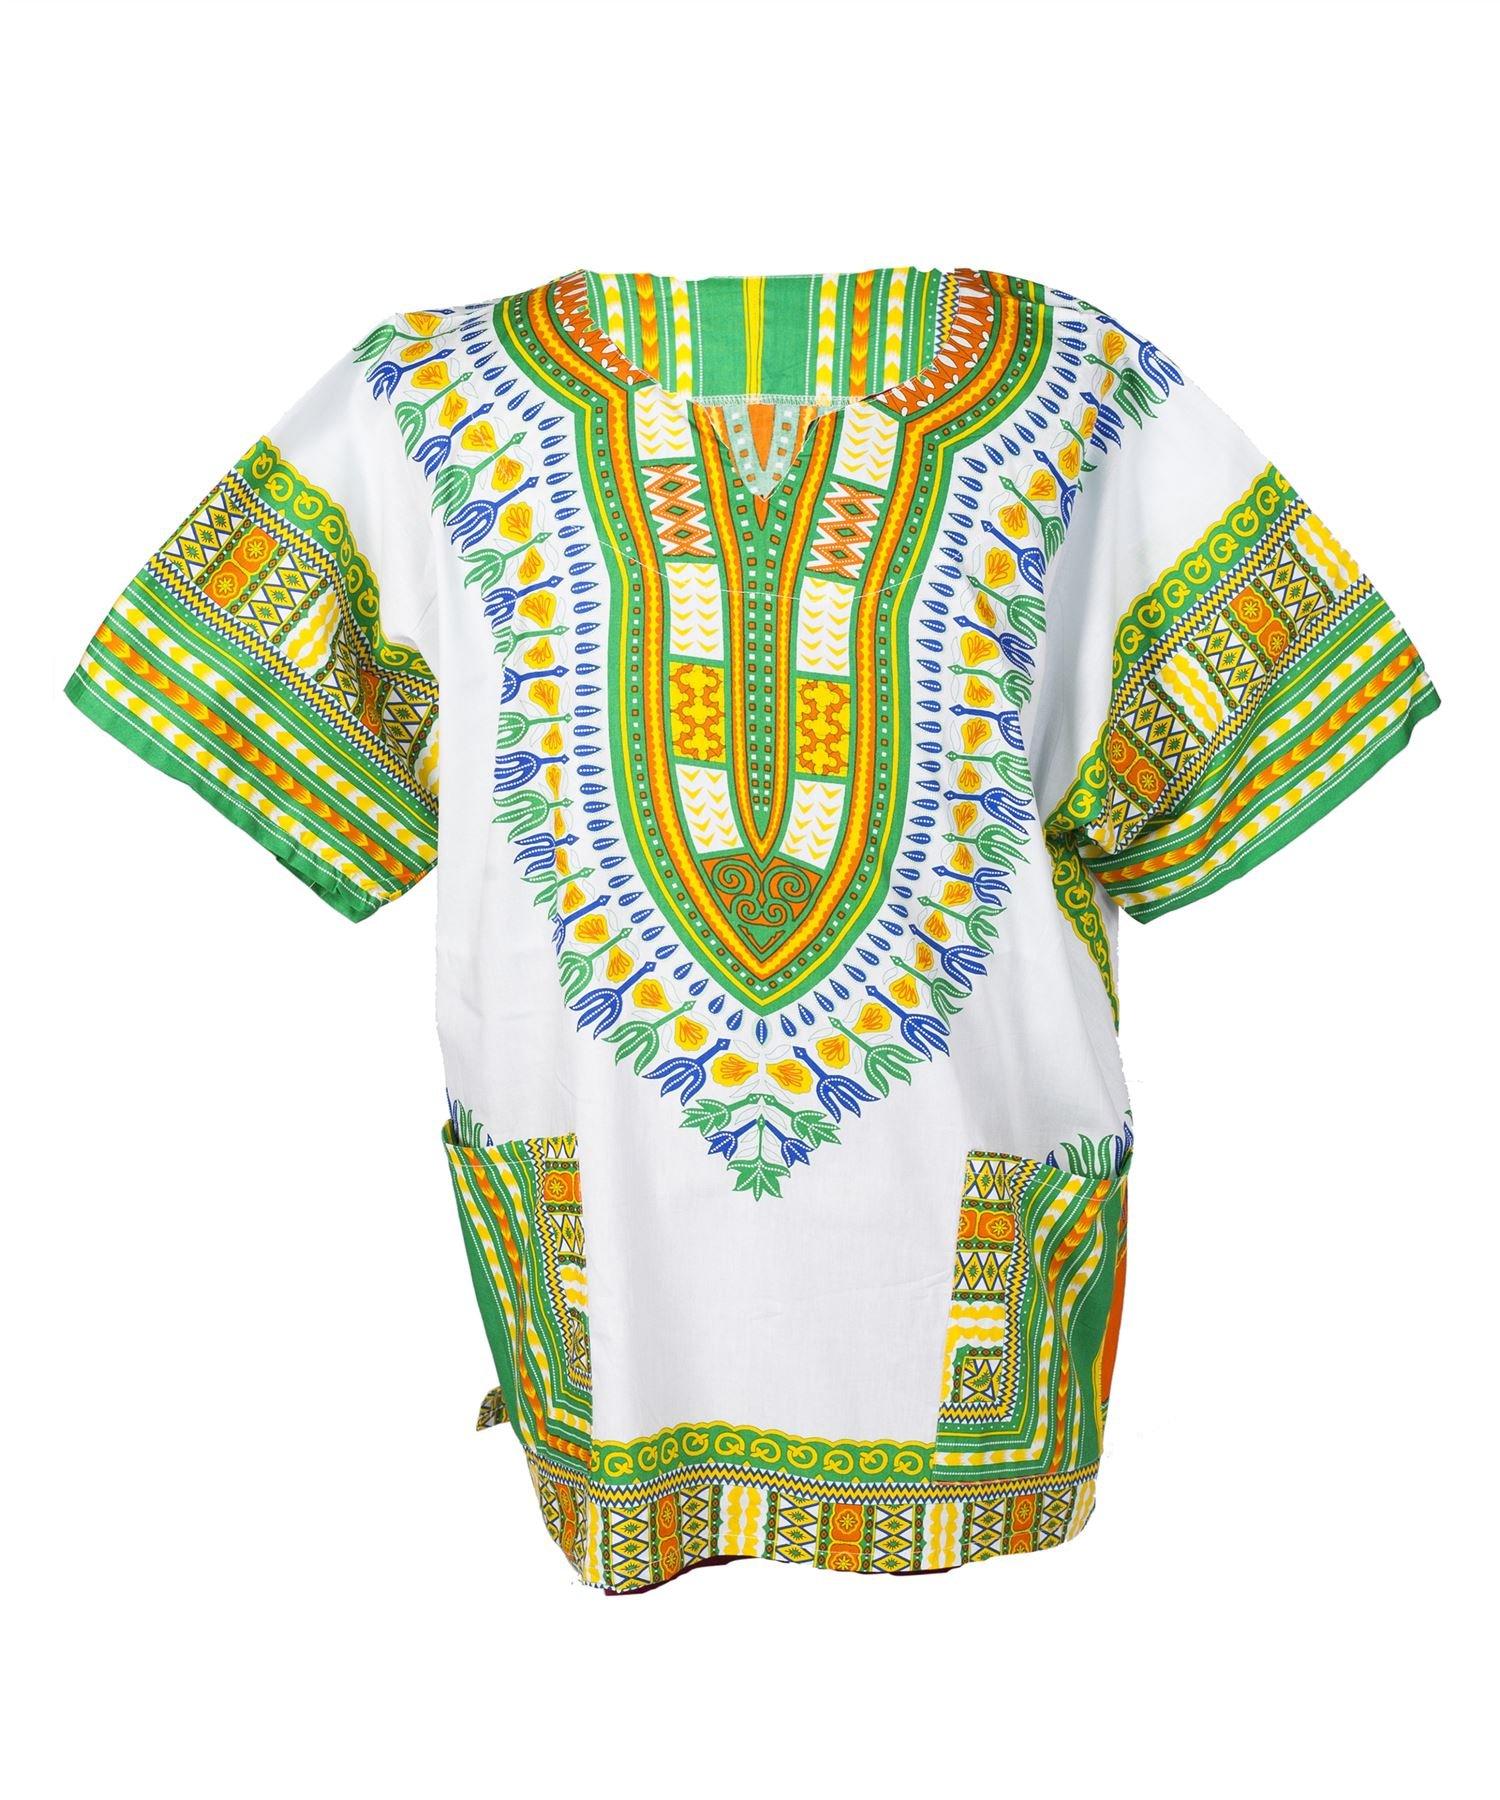 Lofbaz Traditional African Print Unisex Dashiki Size XXXL White and Grass Green